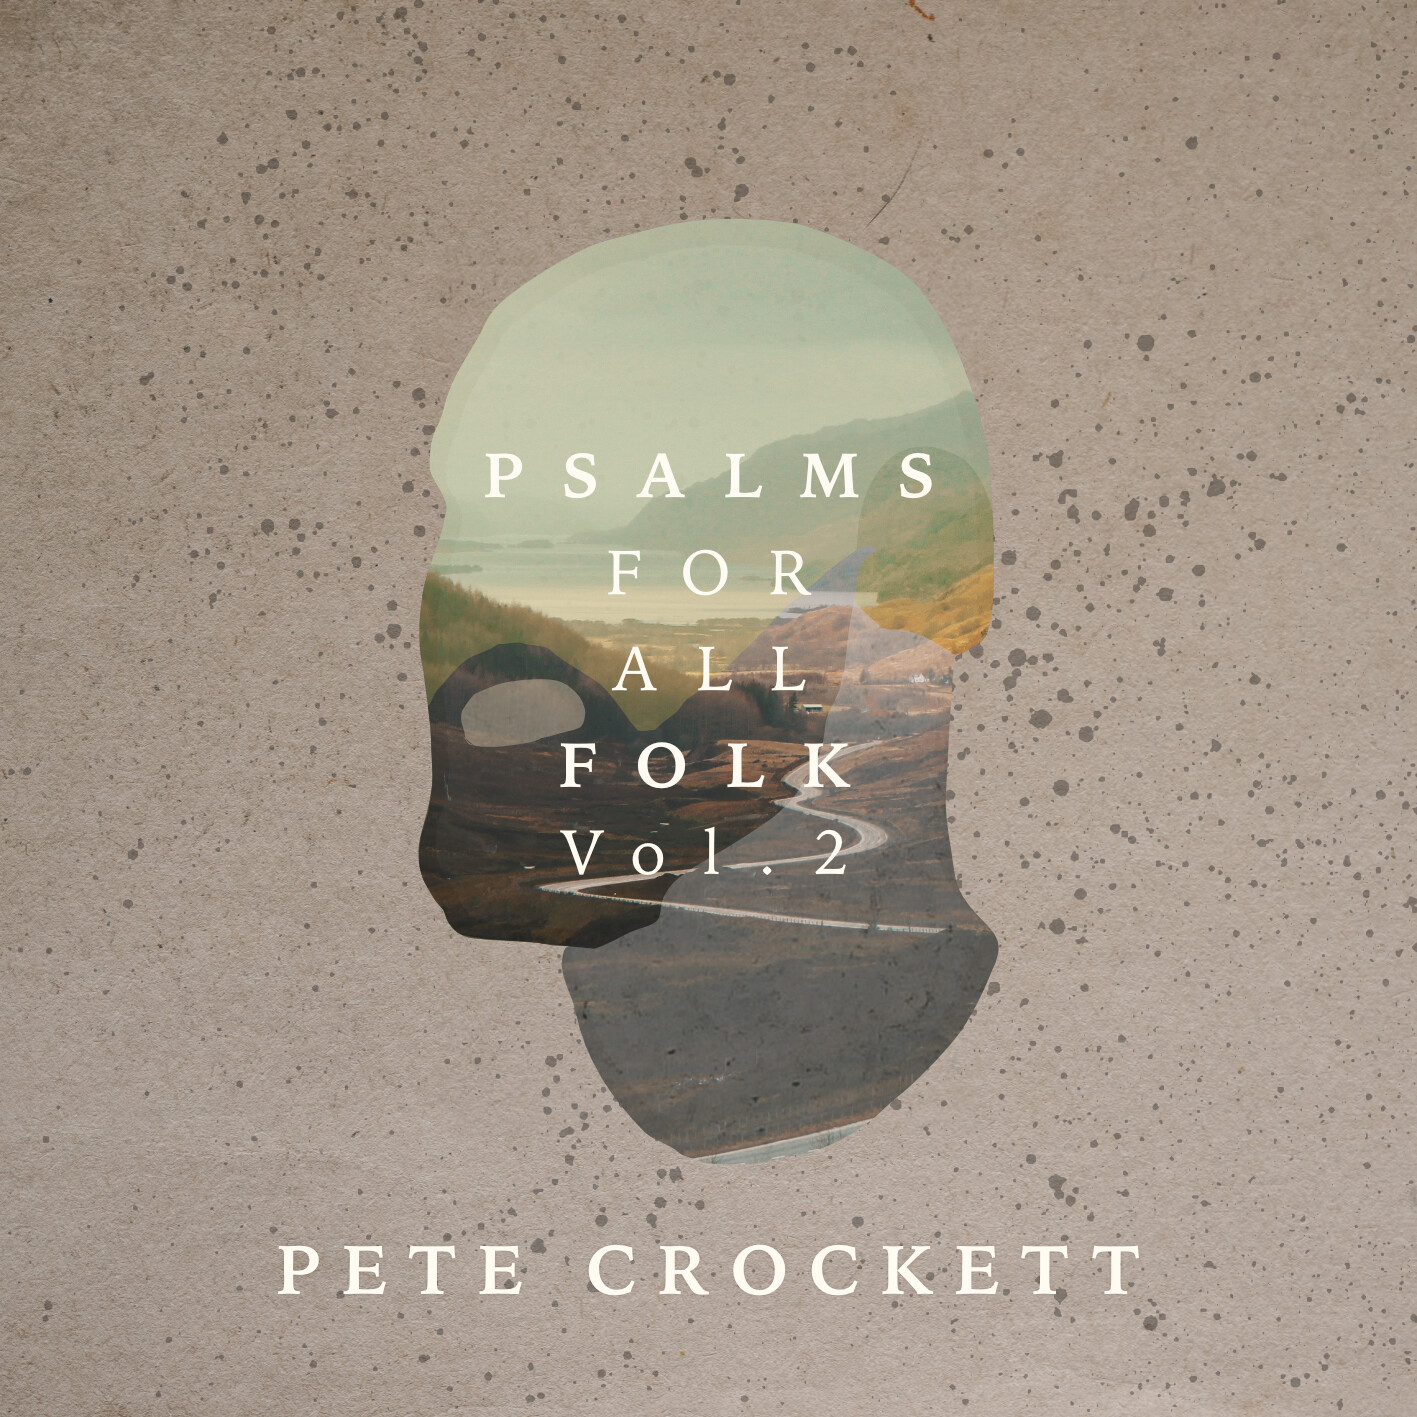 Psalms For All Folk Vol.2